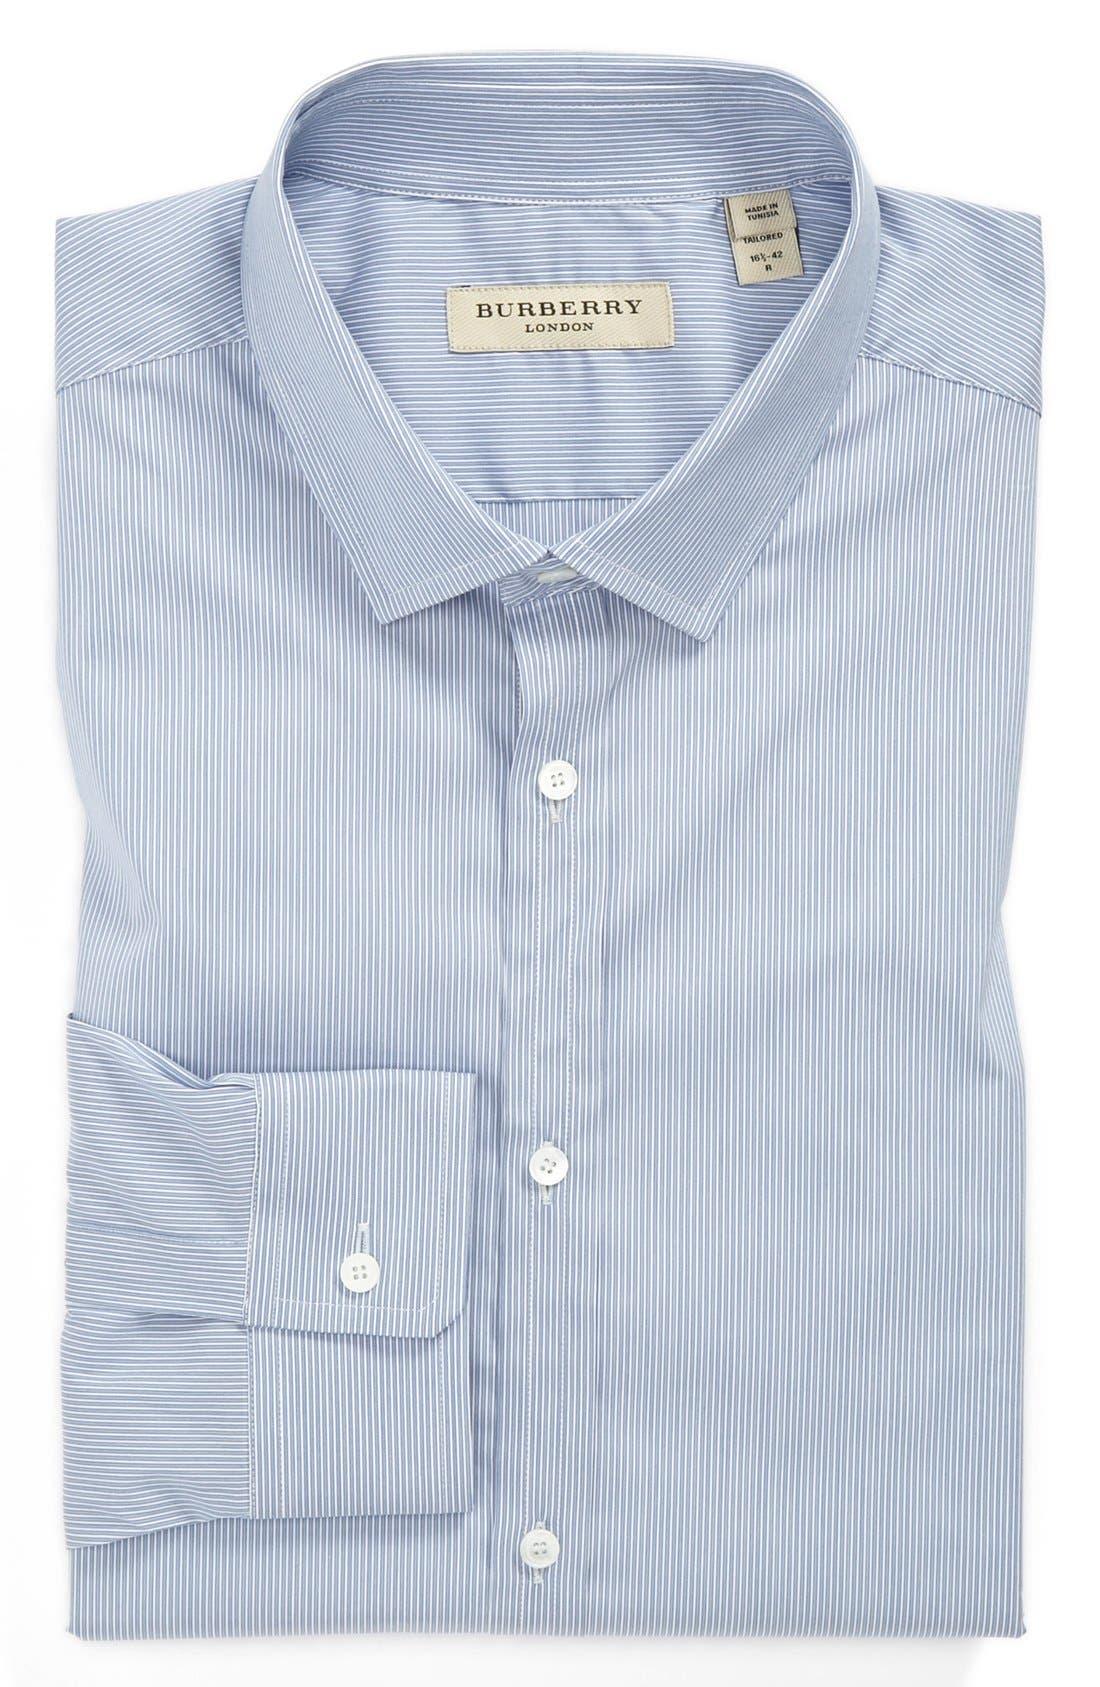 BURBERRY London Stripe Tailored Fit Dress Shirt, Main, color, 426